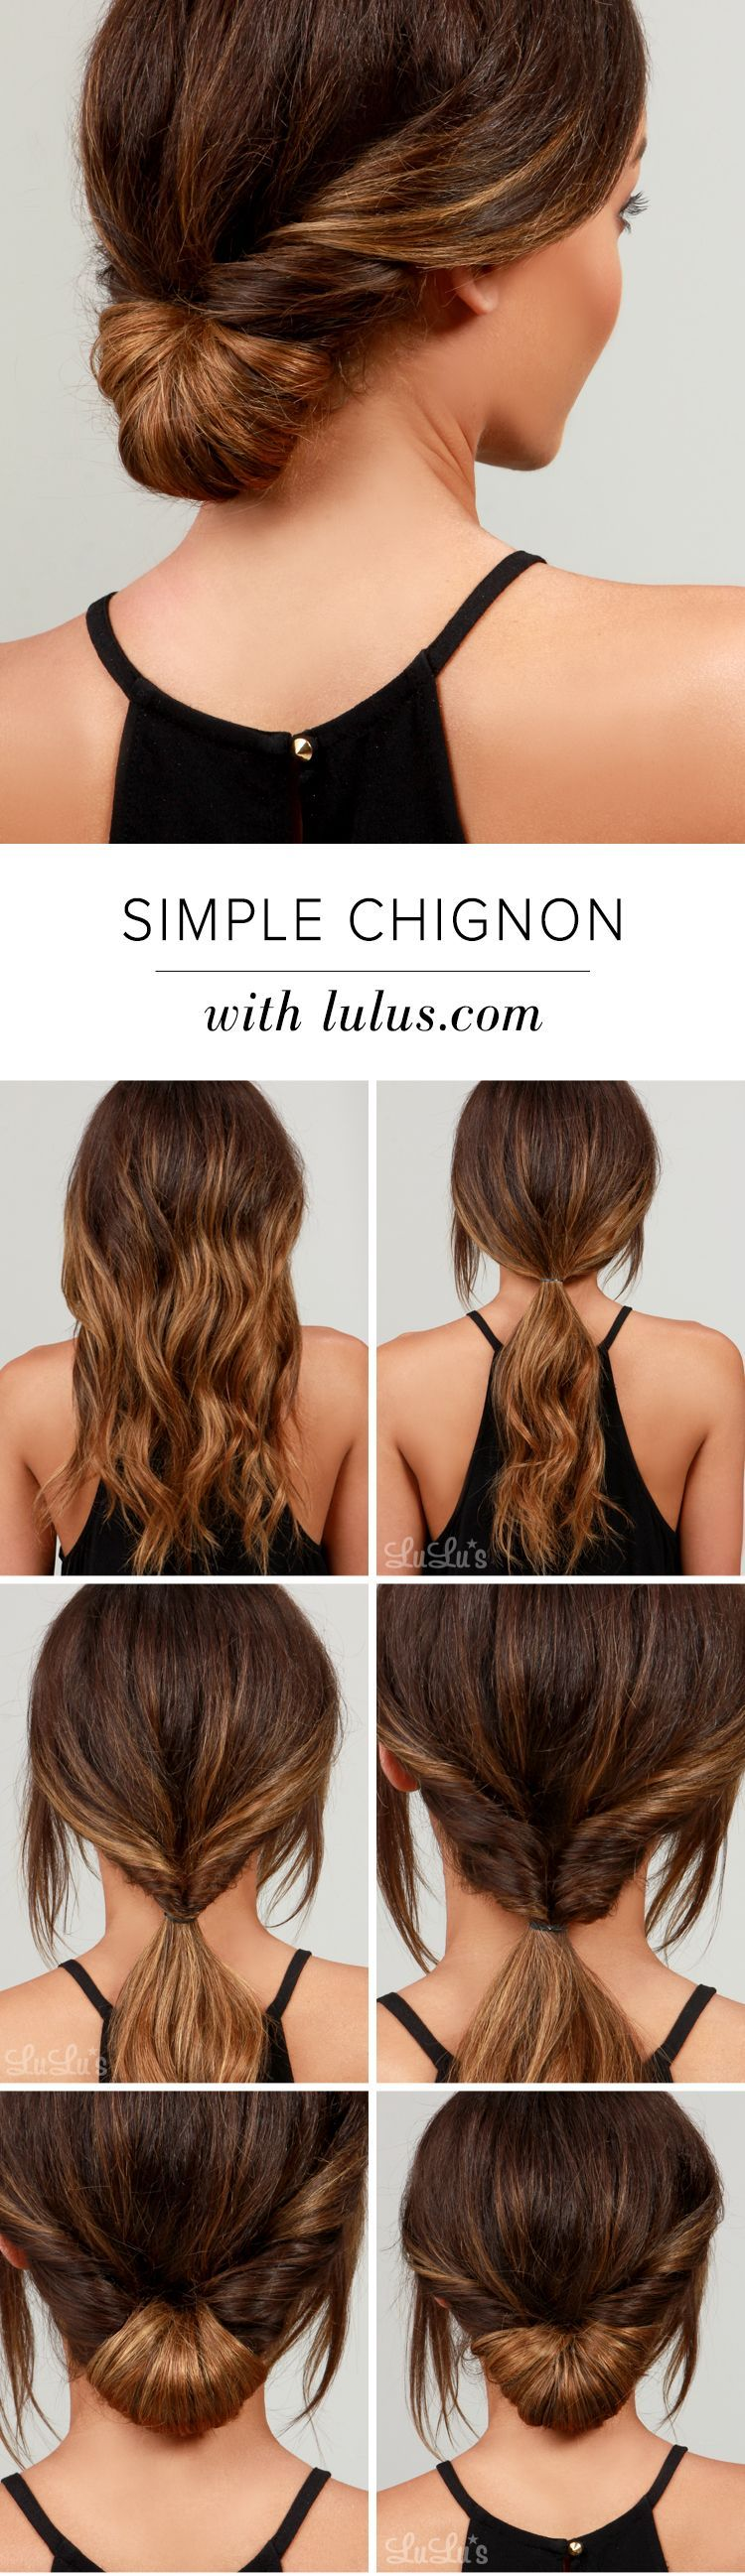 Lulus howto simple chignon hair tutorial chignons hair style